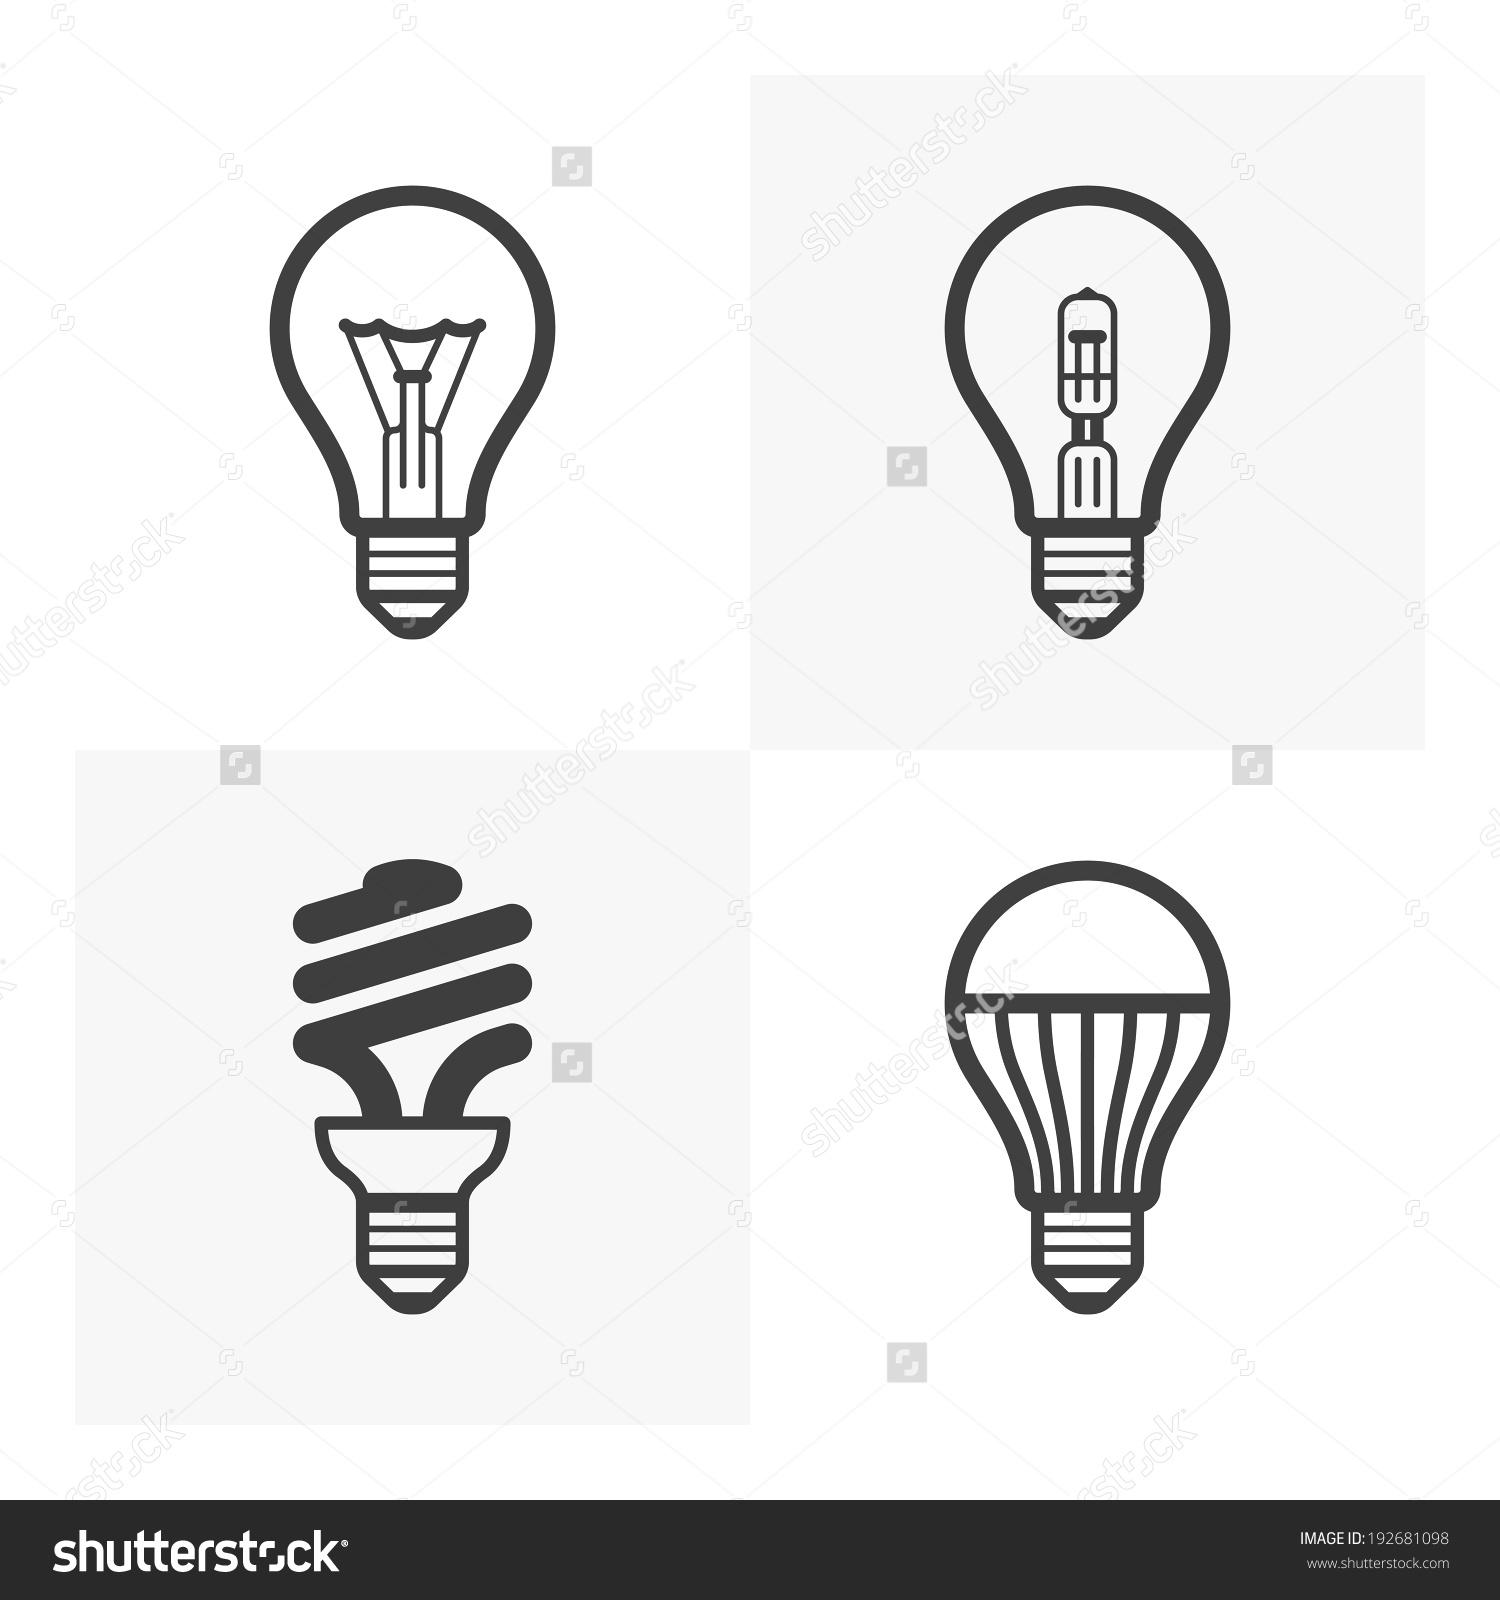 Various Light Bulb Icons Standard Halogen Stock Vector 192681098.